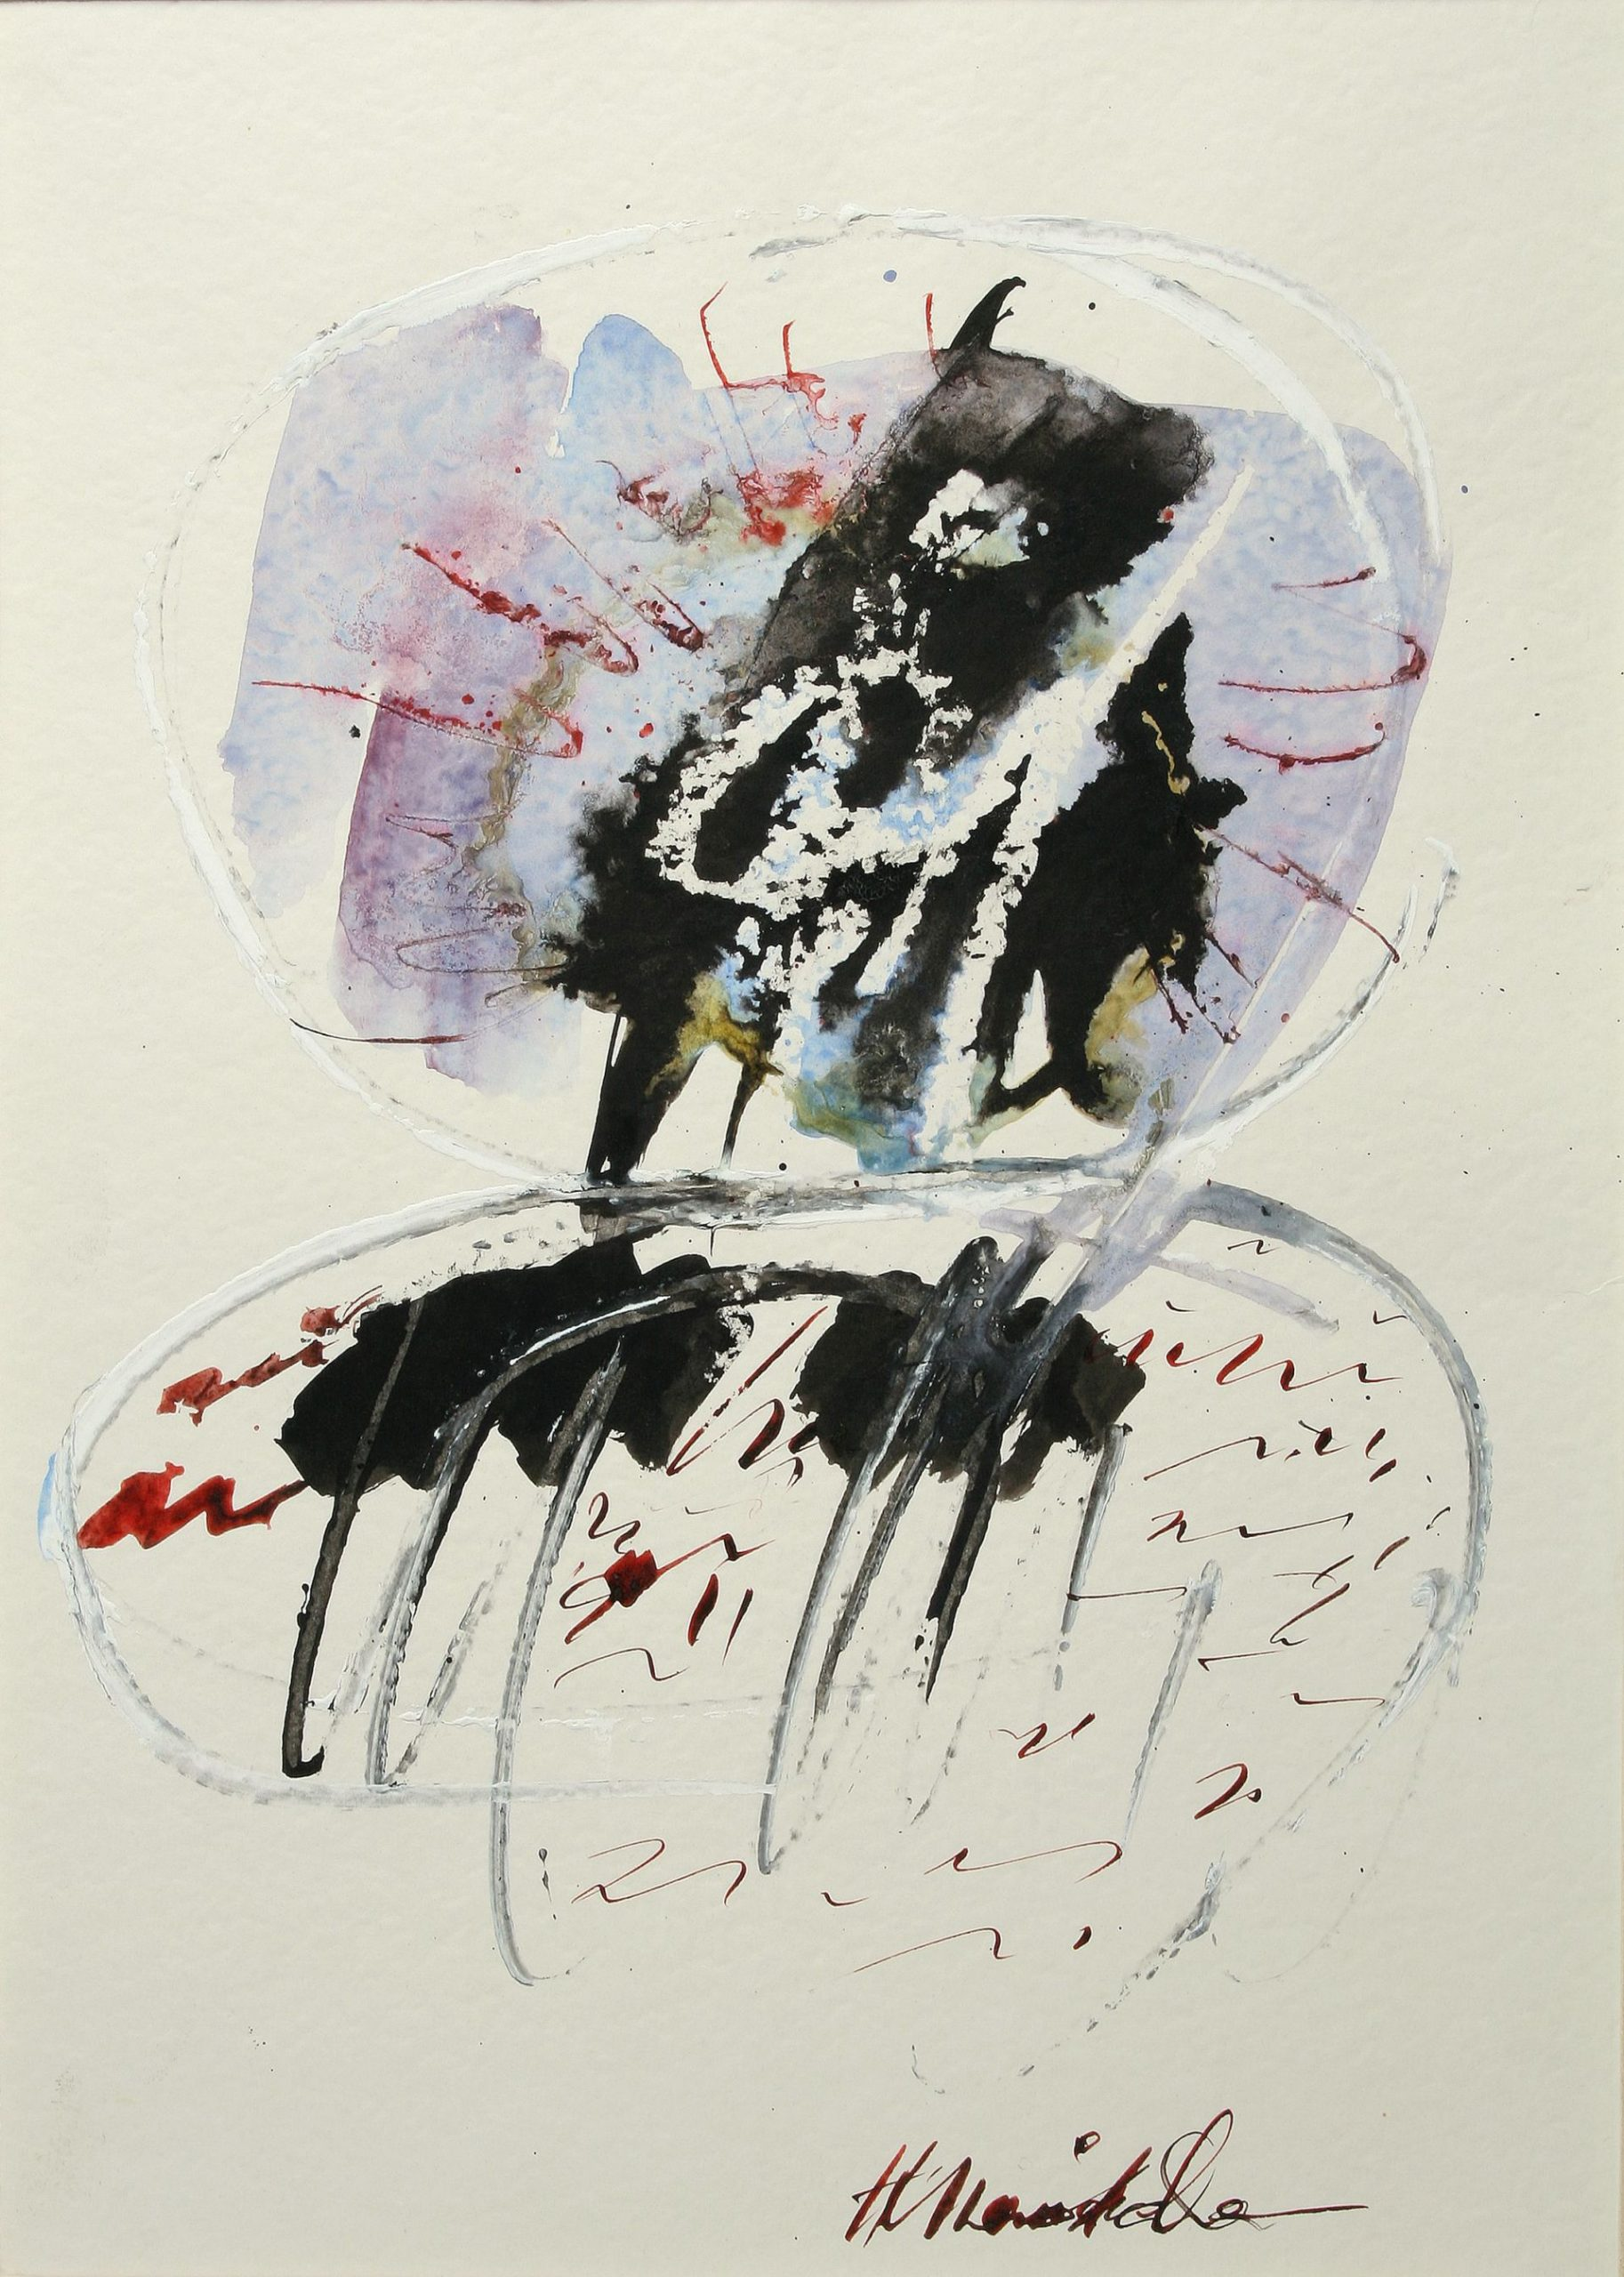 Hans Staudacher-Composition 01